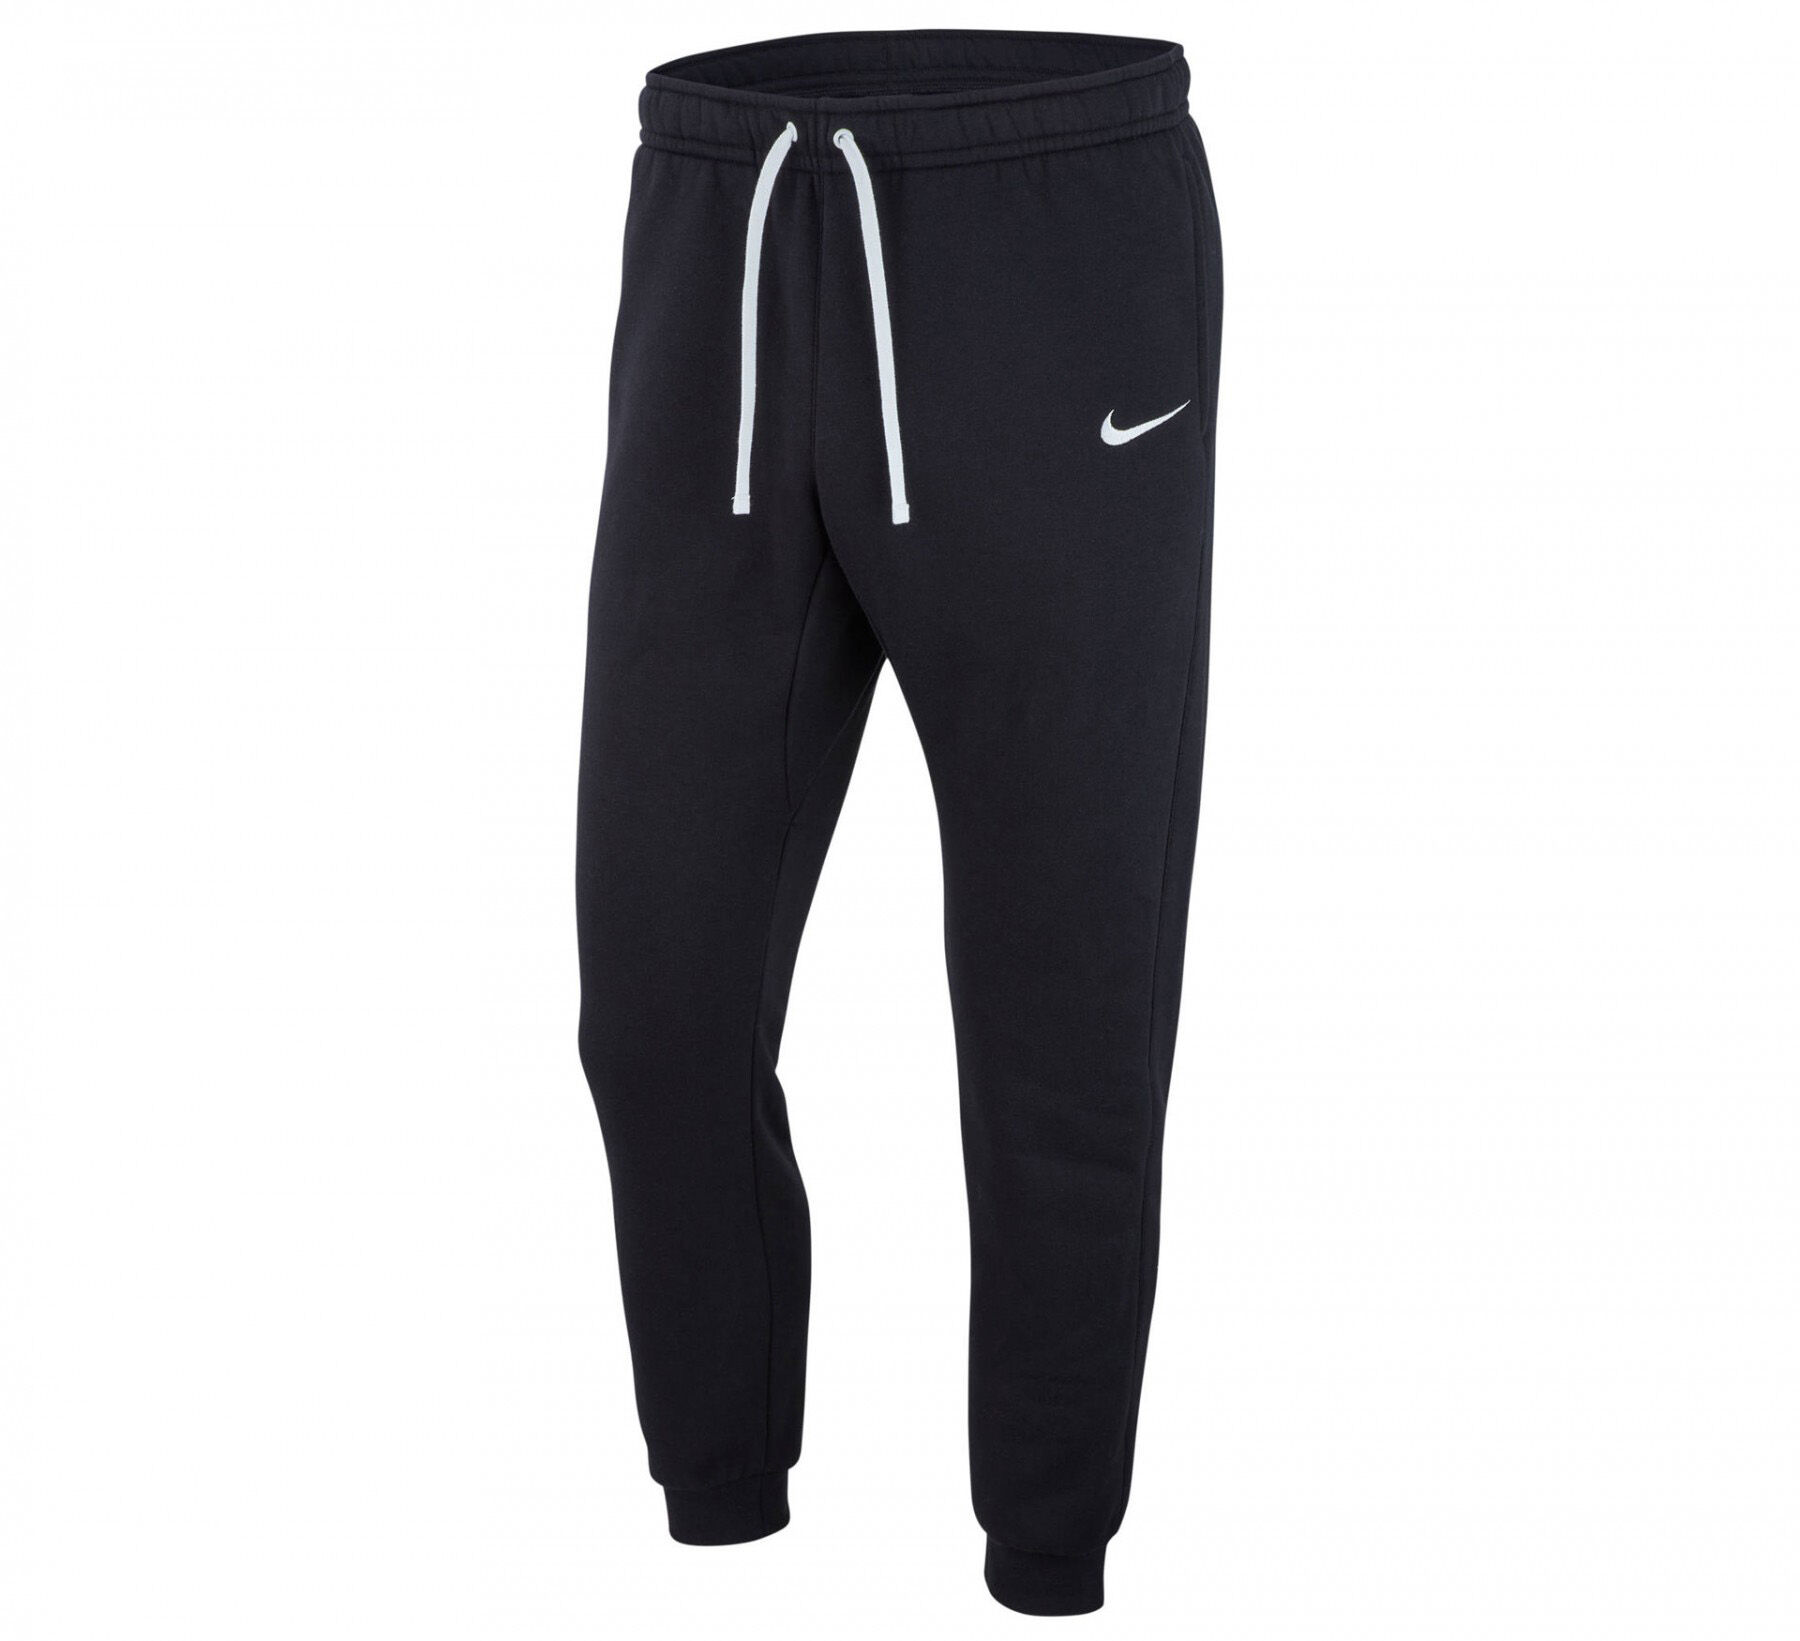 Nike Air Max 95 OG MC SP Black (ERDL), Men's Fashion, Men's